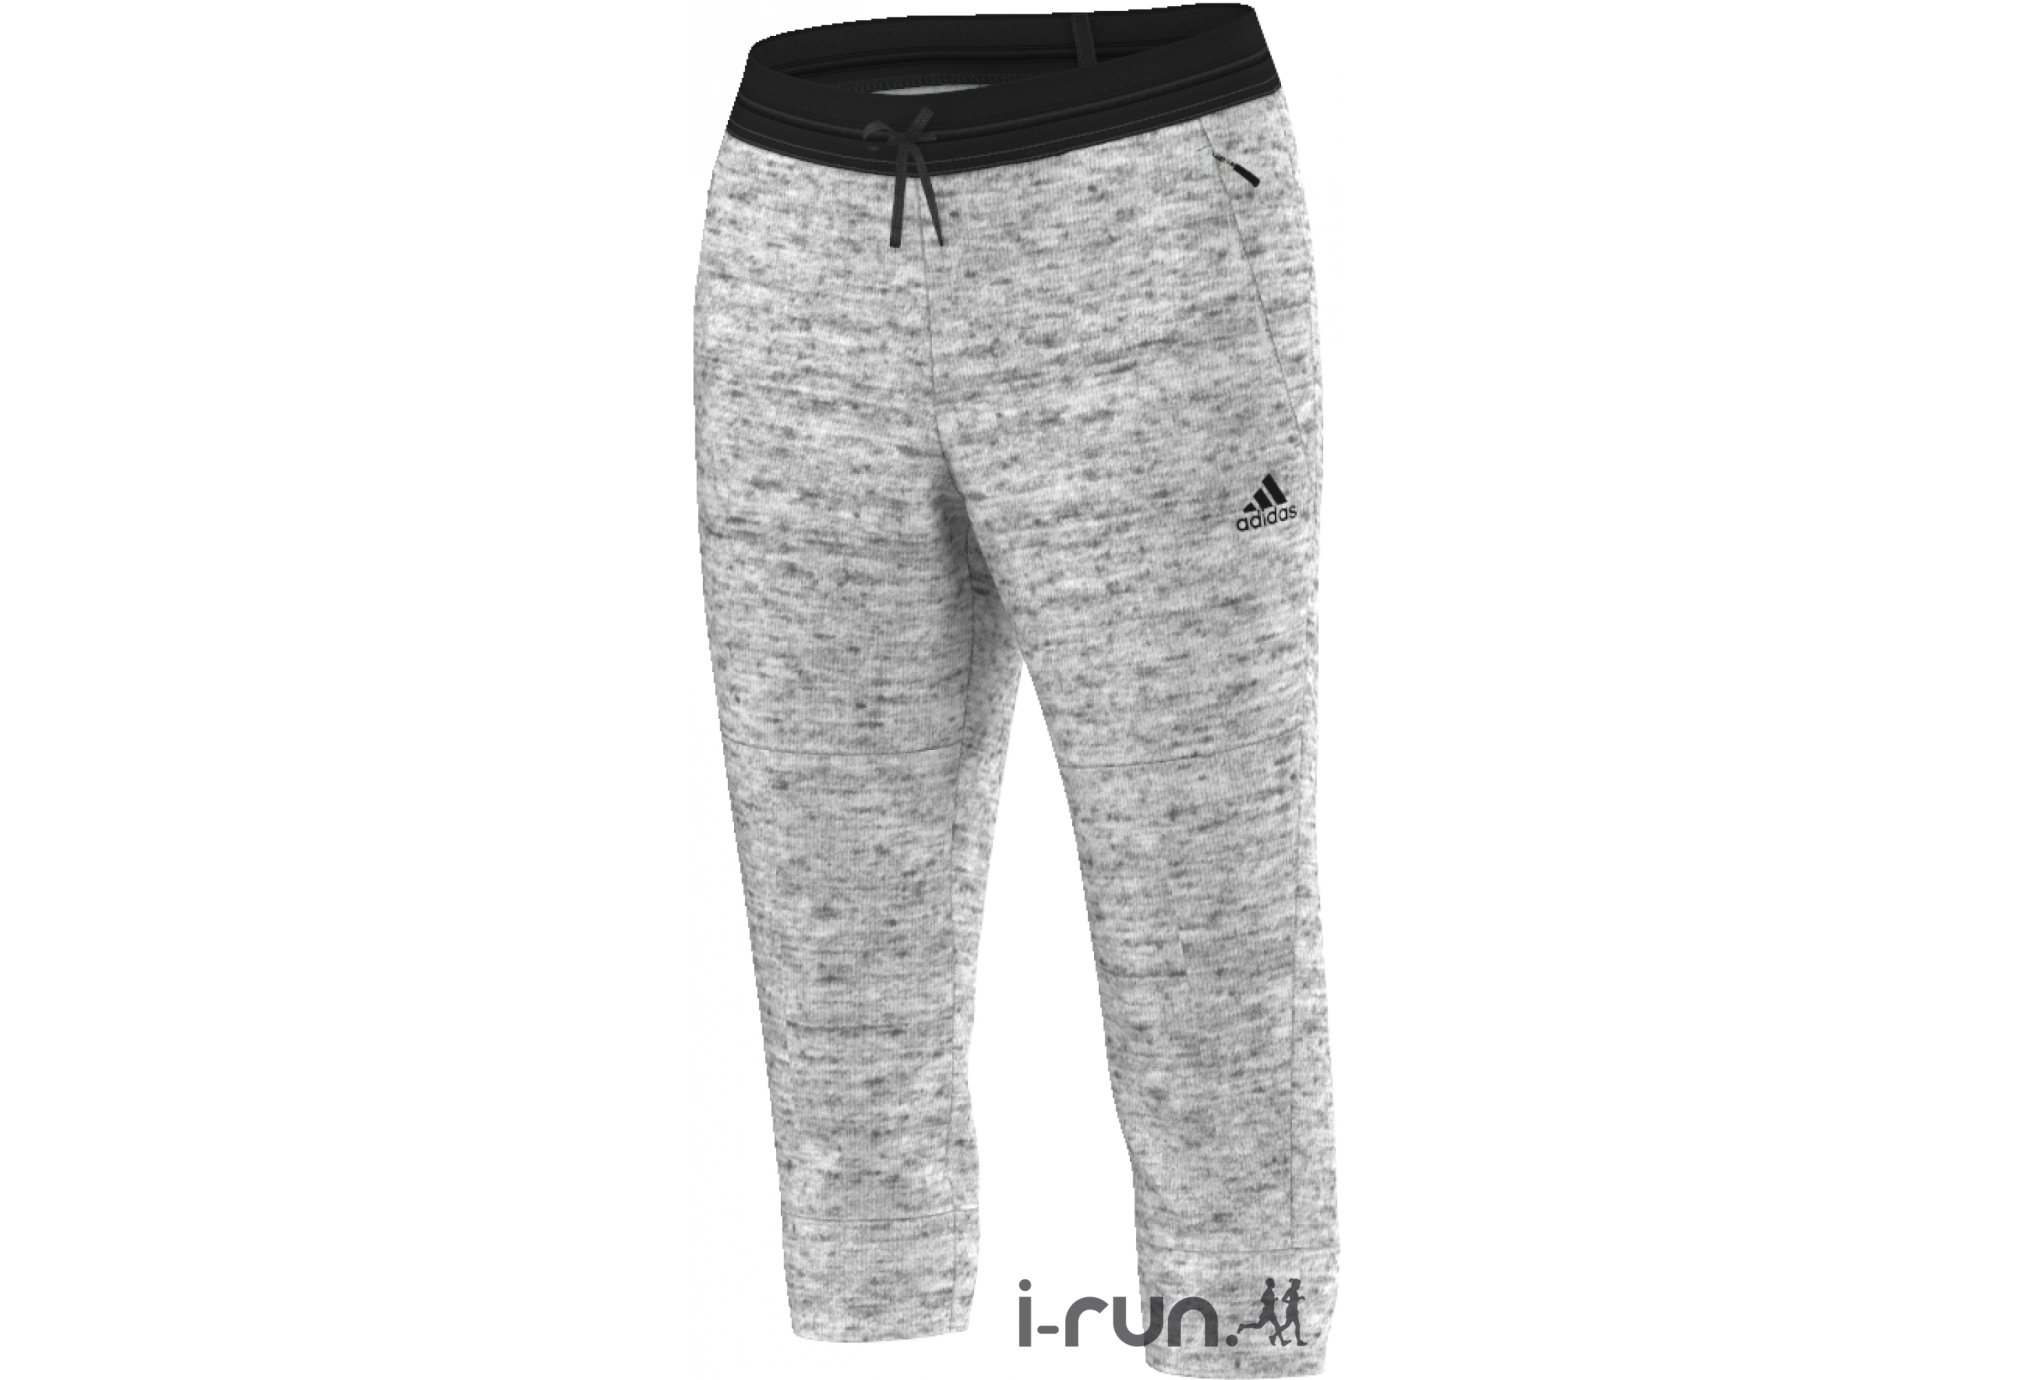 Adidas Pantalon 3/4 molleton de coton w vêtement running femme